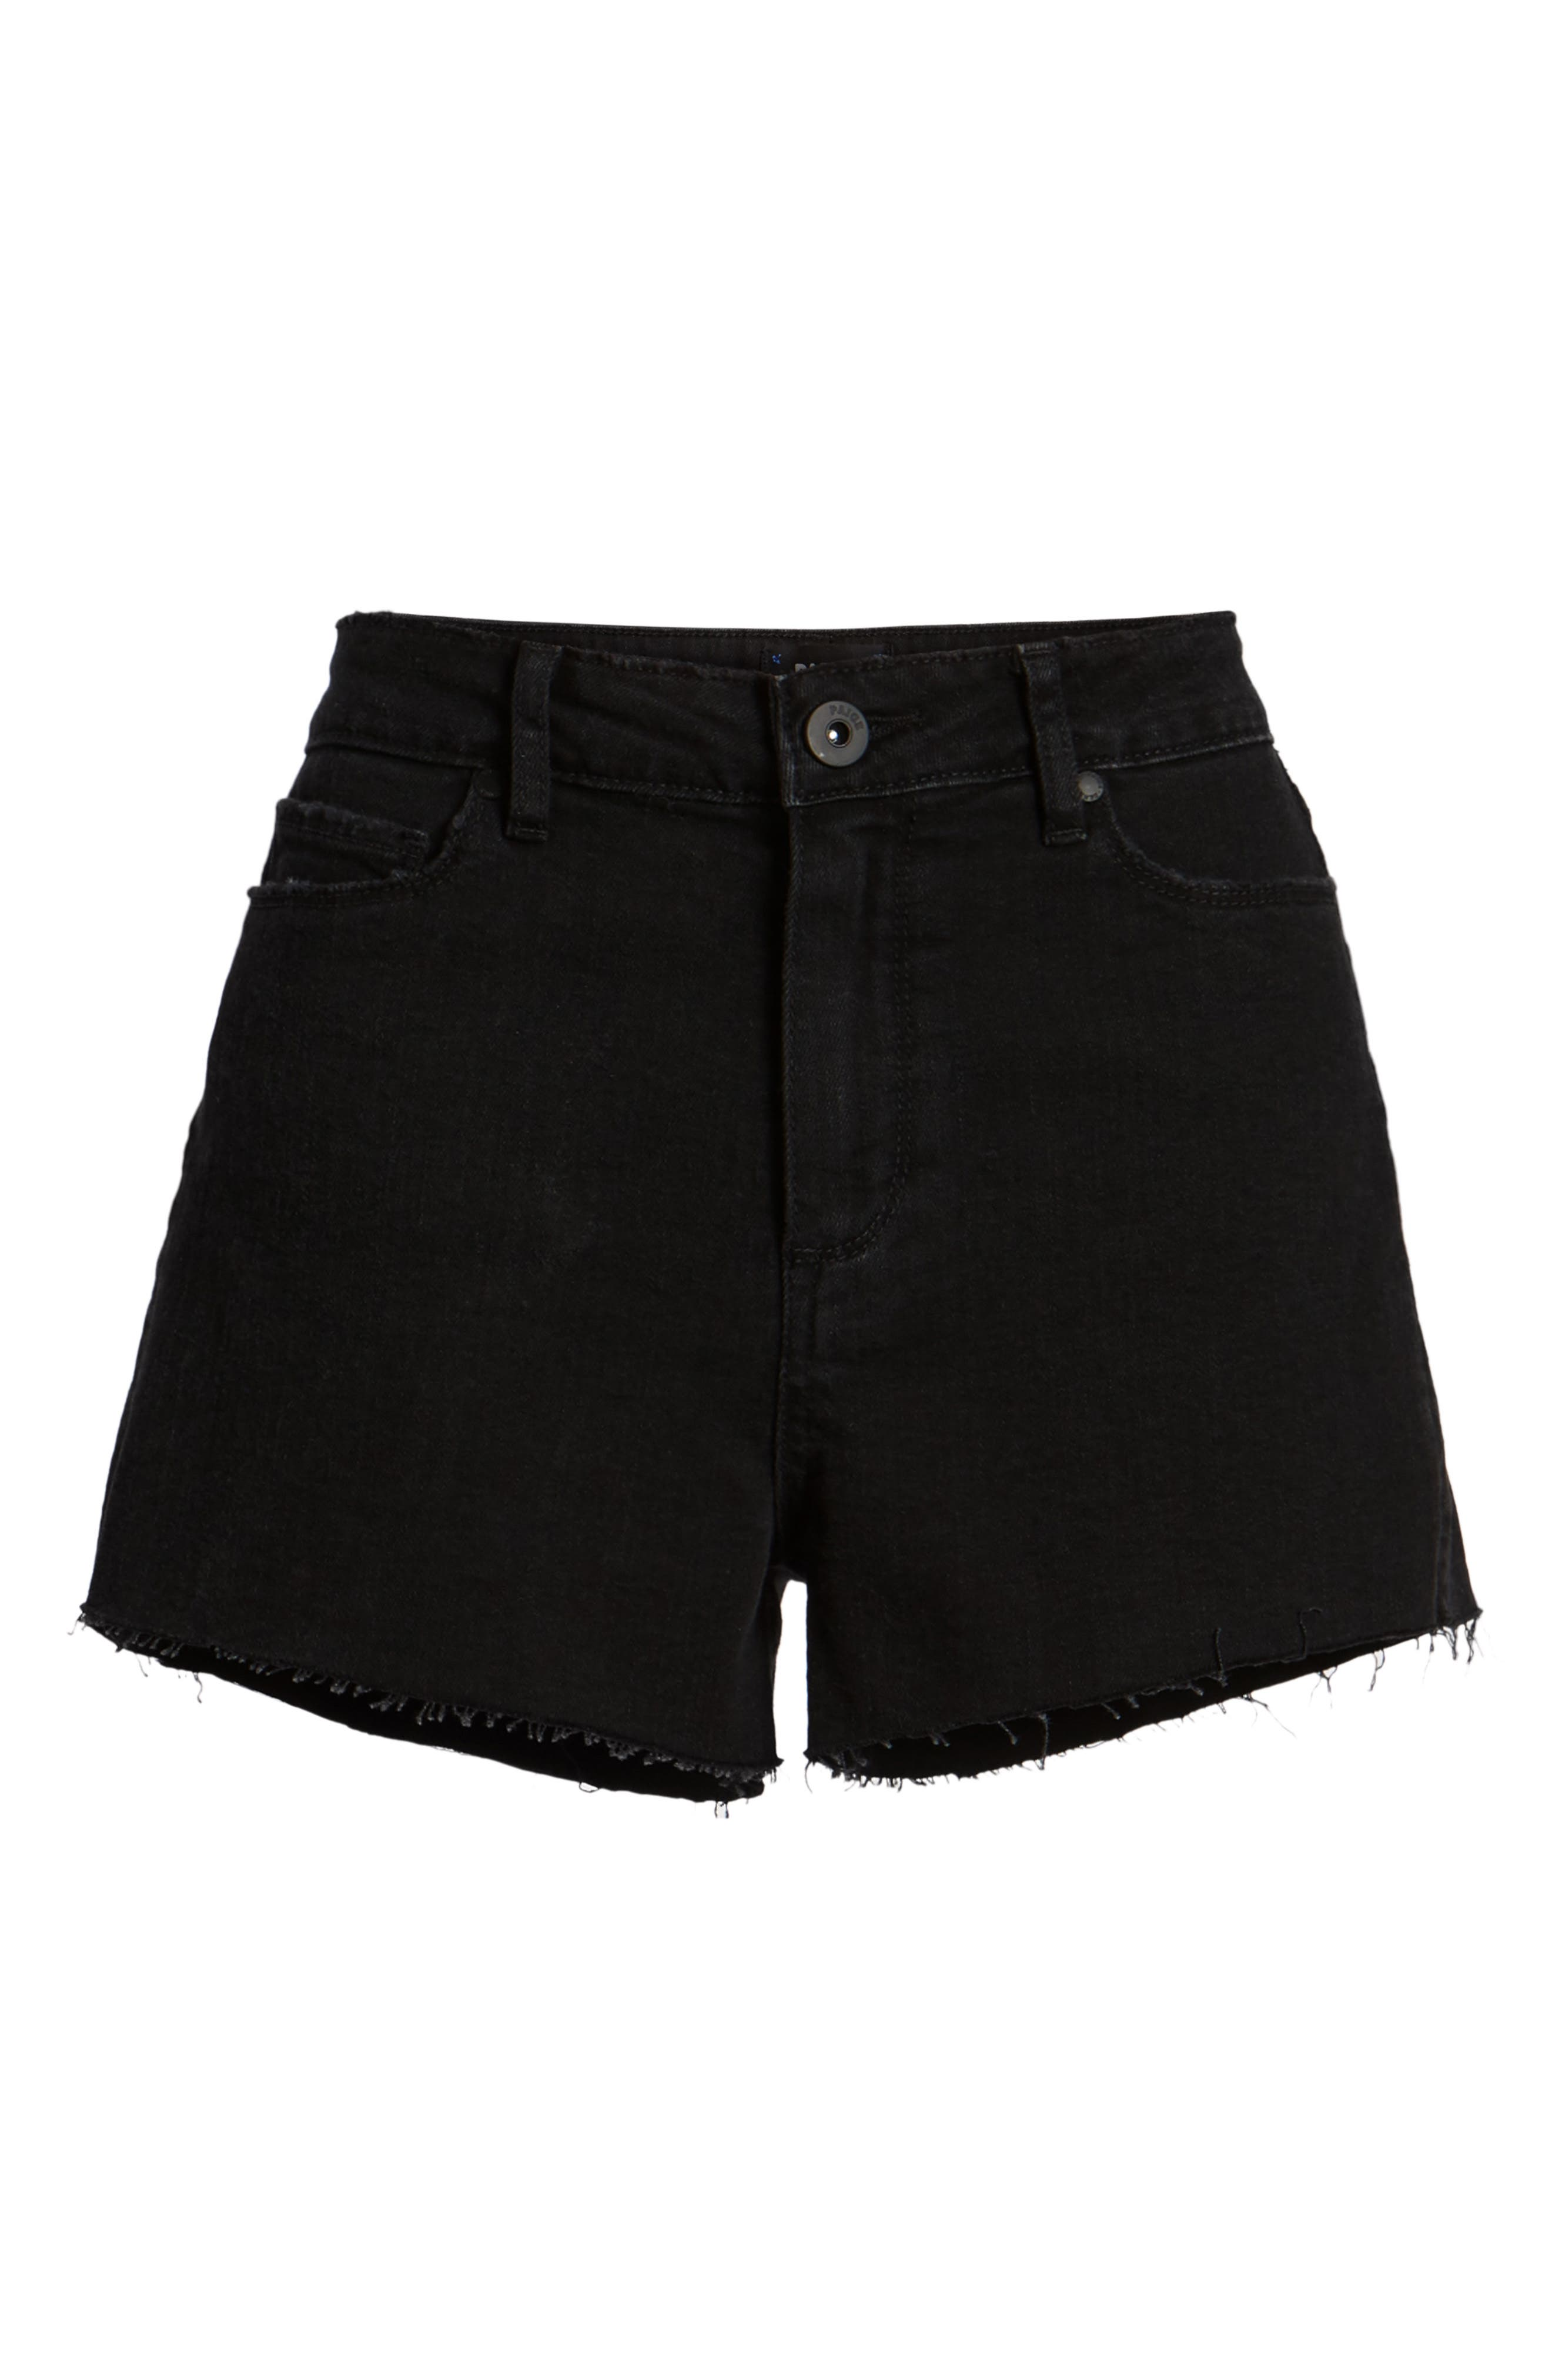 'Margot' High Rise Cutoff Denim Shorts,                             Alternate thumbnail 6, color,                             001